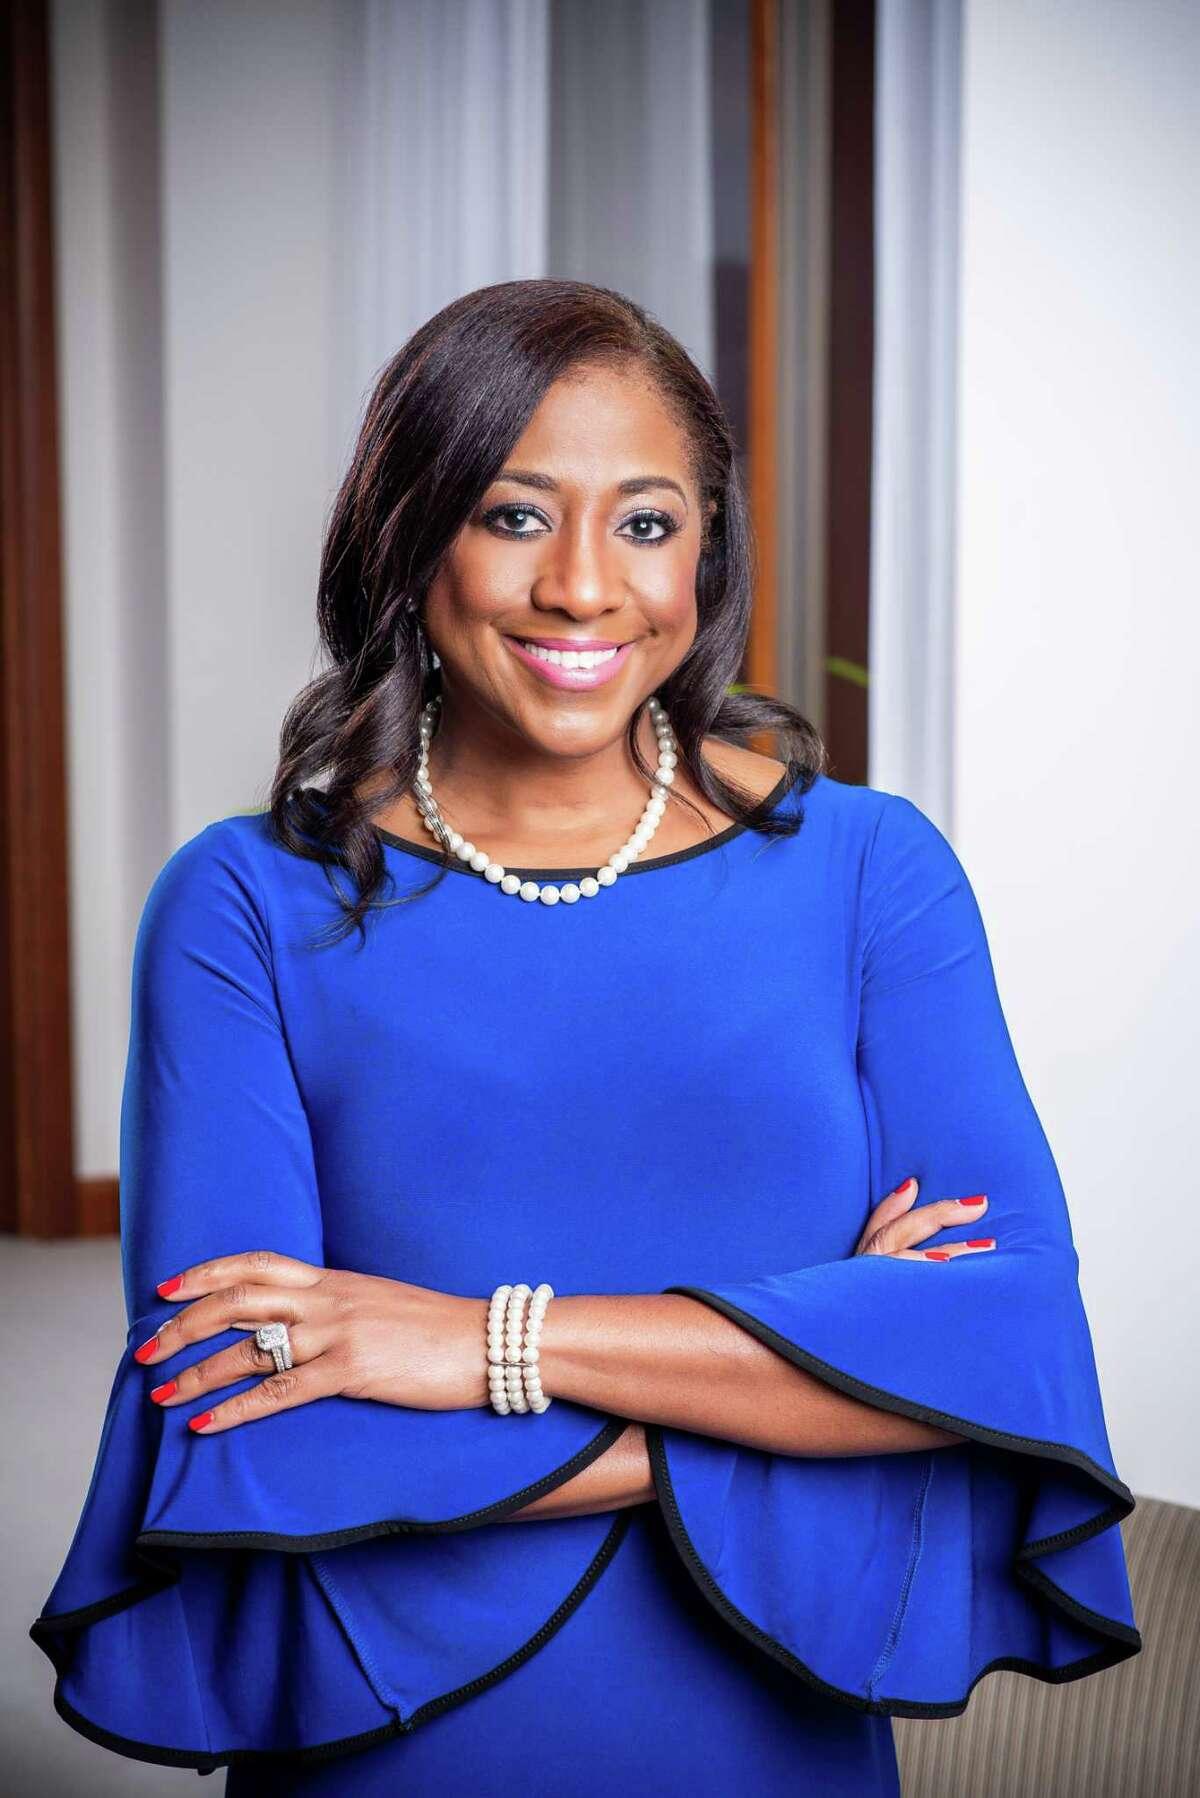 Rosilyn Houston, BBVA USA's Senior Executive Vice President and Chief Talent & Culture Executive